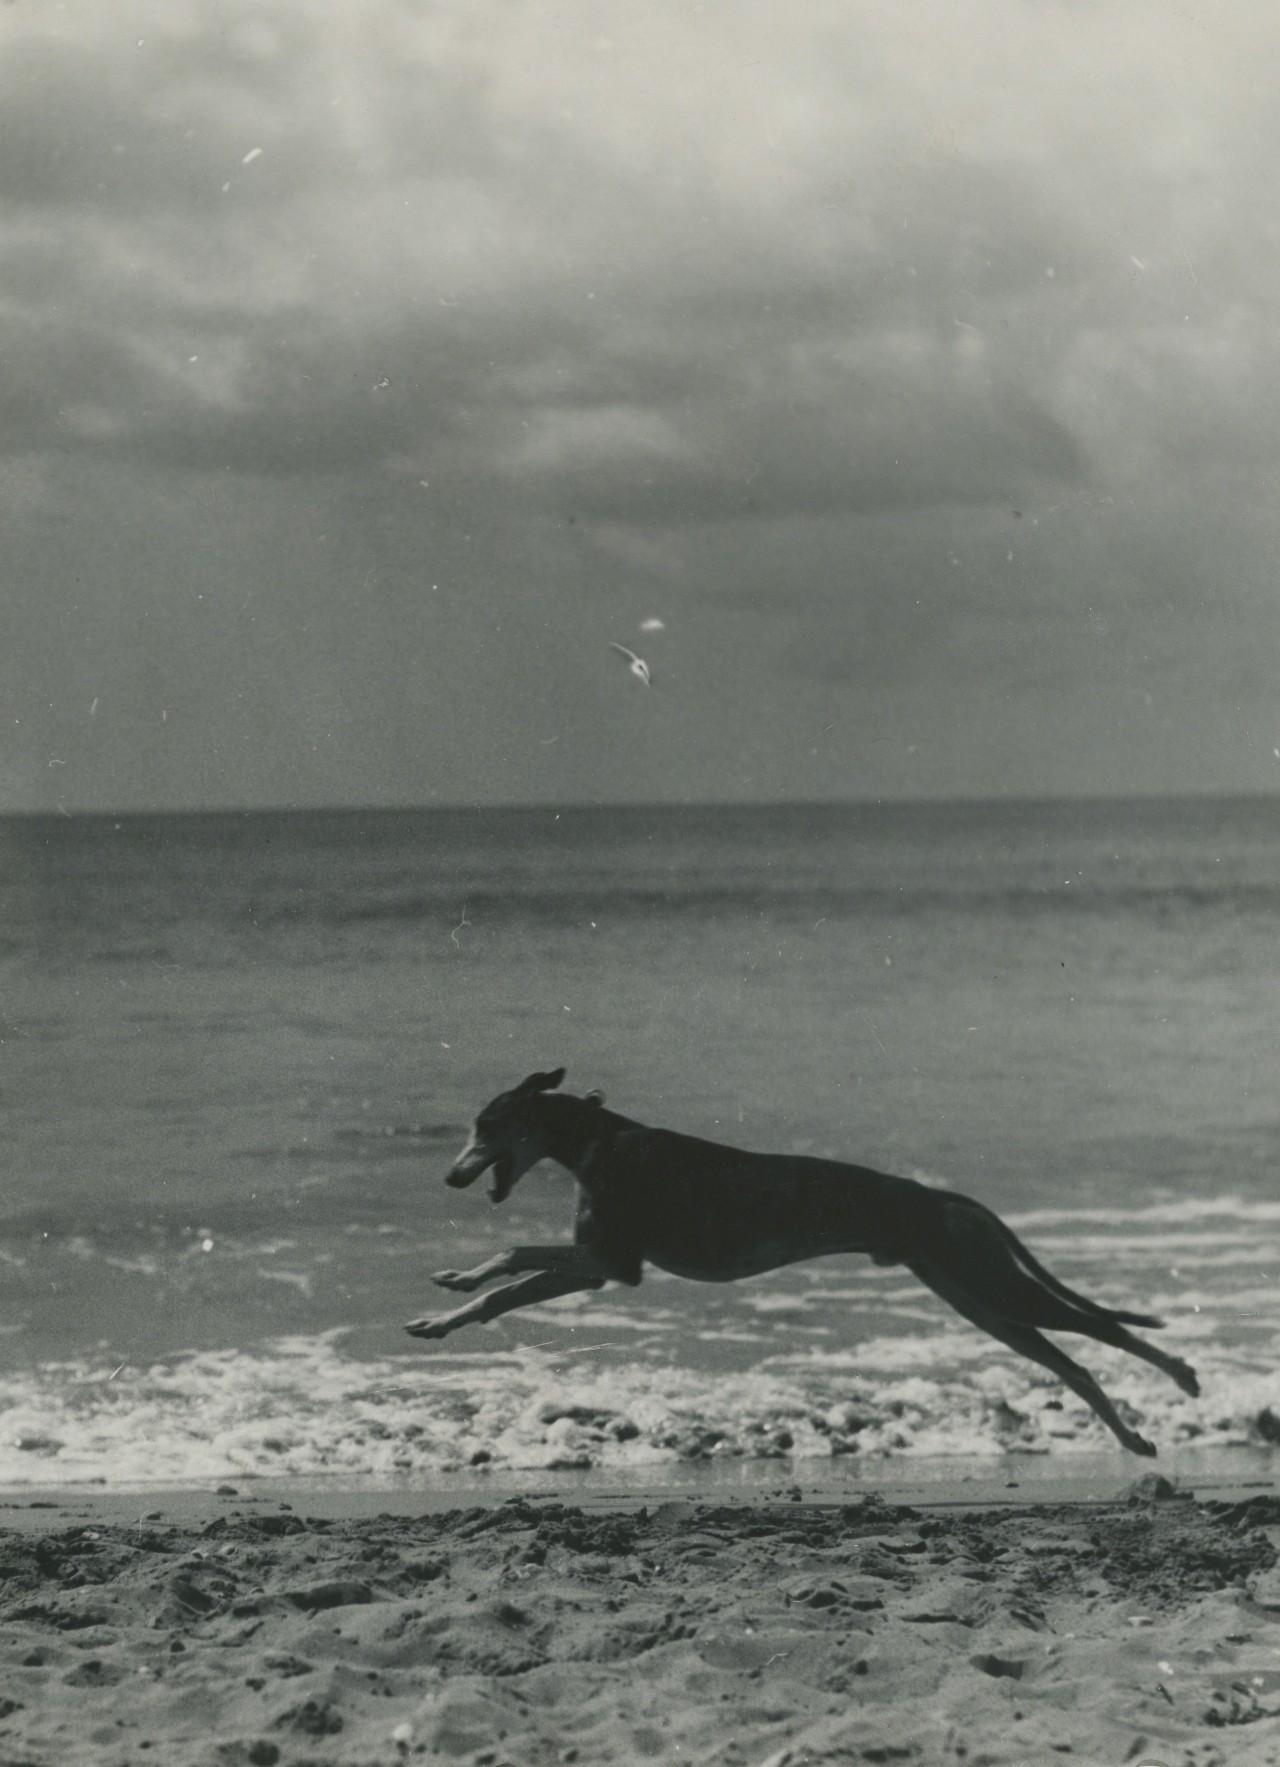 Собака на пляже. Фотограф Билл Брандт